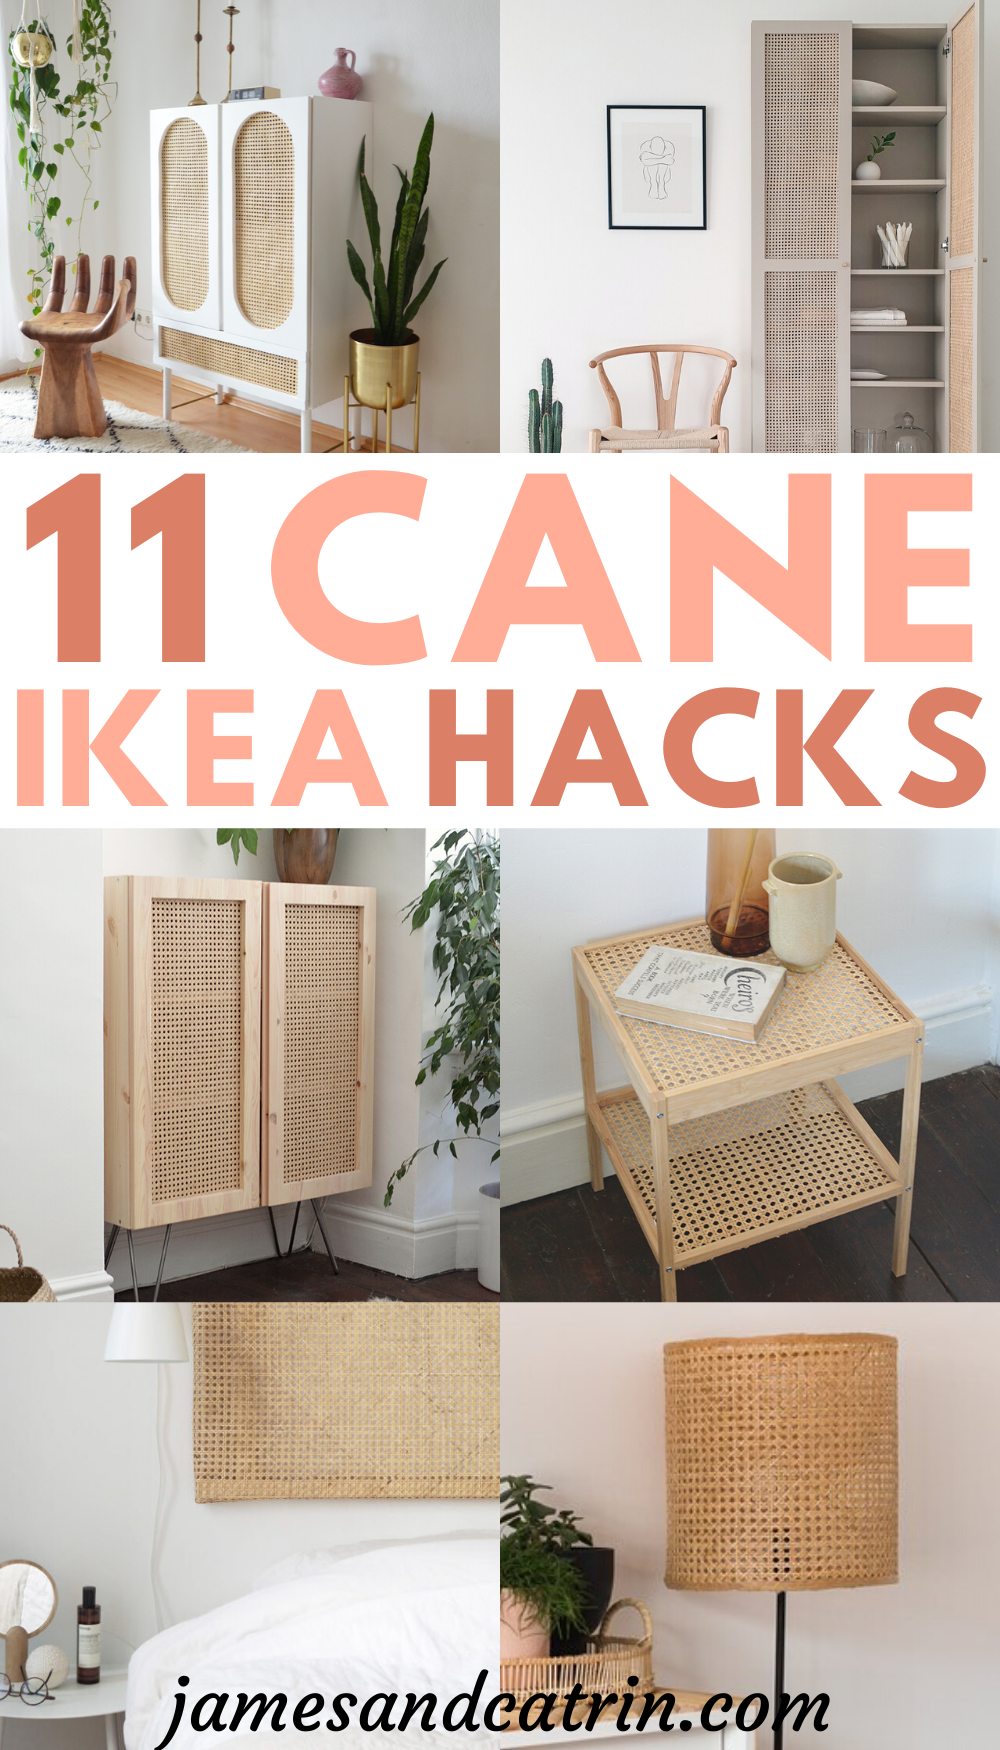 Stunning Cane Ikea Hacks that Show Cane is King | Diy